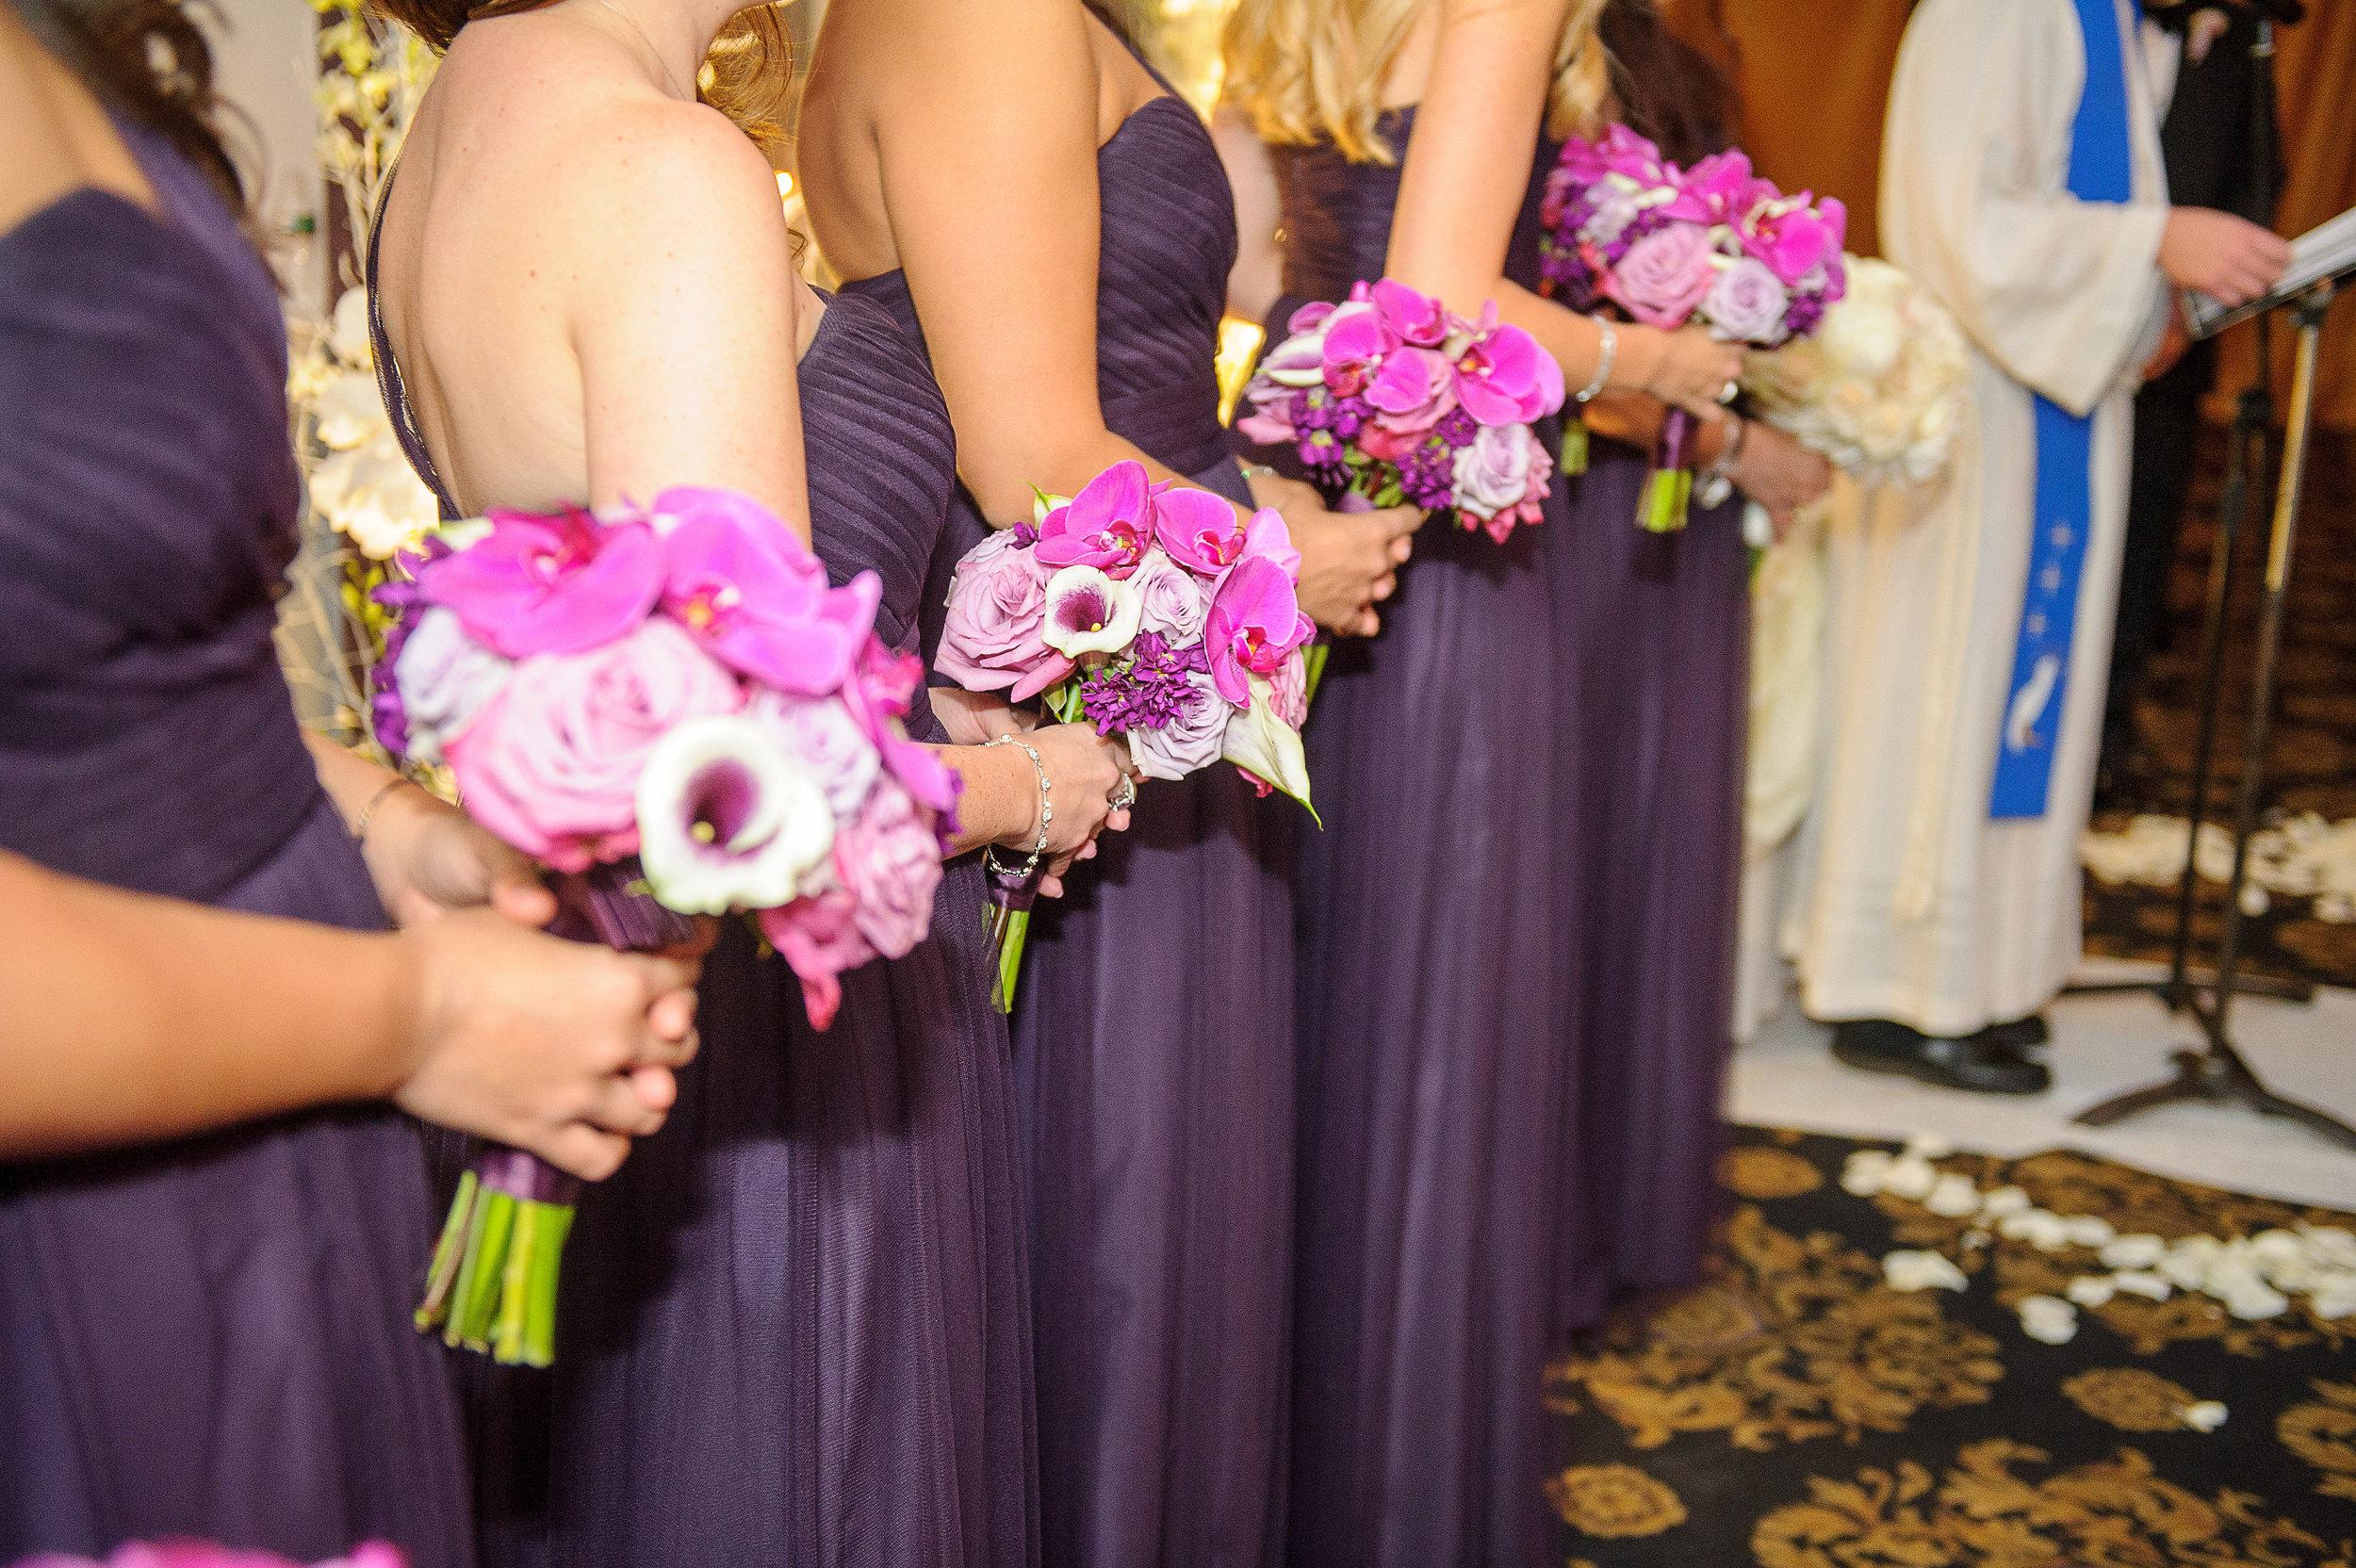 Ceci_New_York_Custom_Invitation_ New_Jersey_Wedding_Luxury_Personalized_Ceci_Style_Bride_Foil_Stamping109.JPG